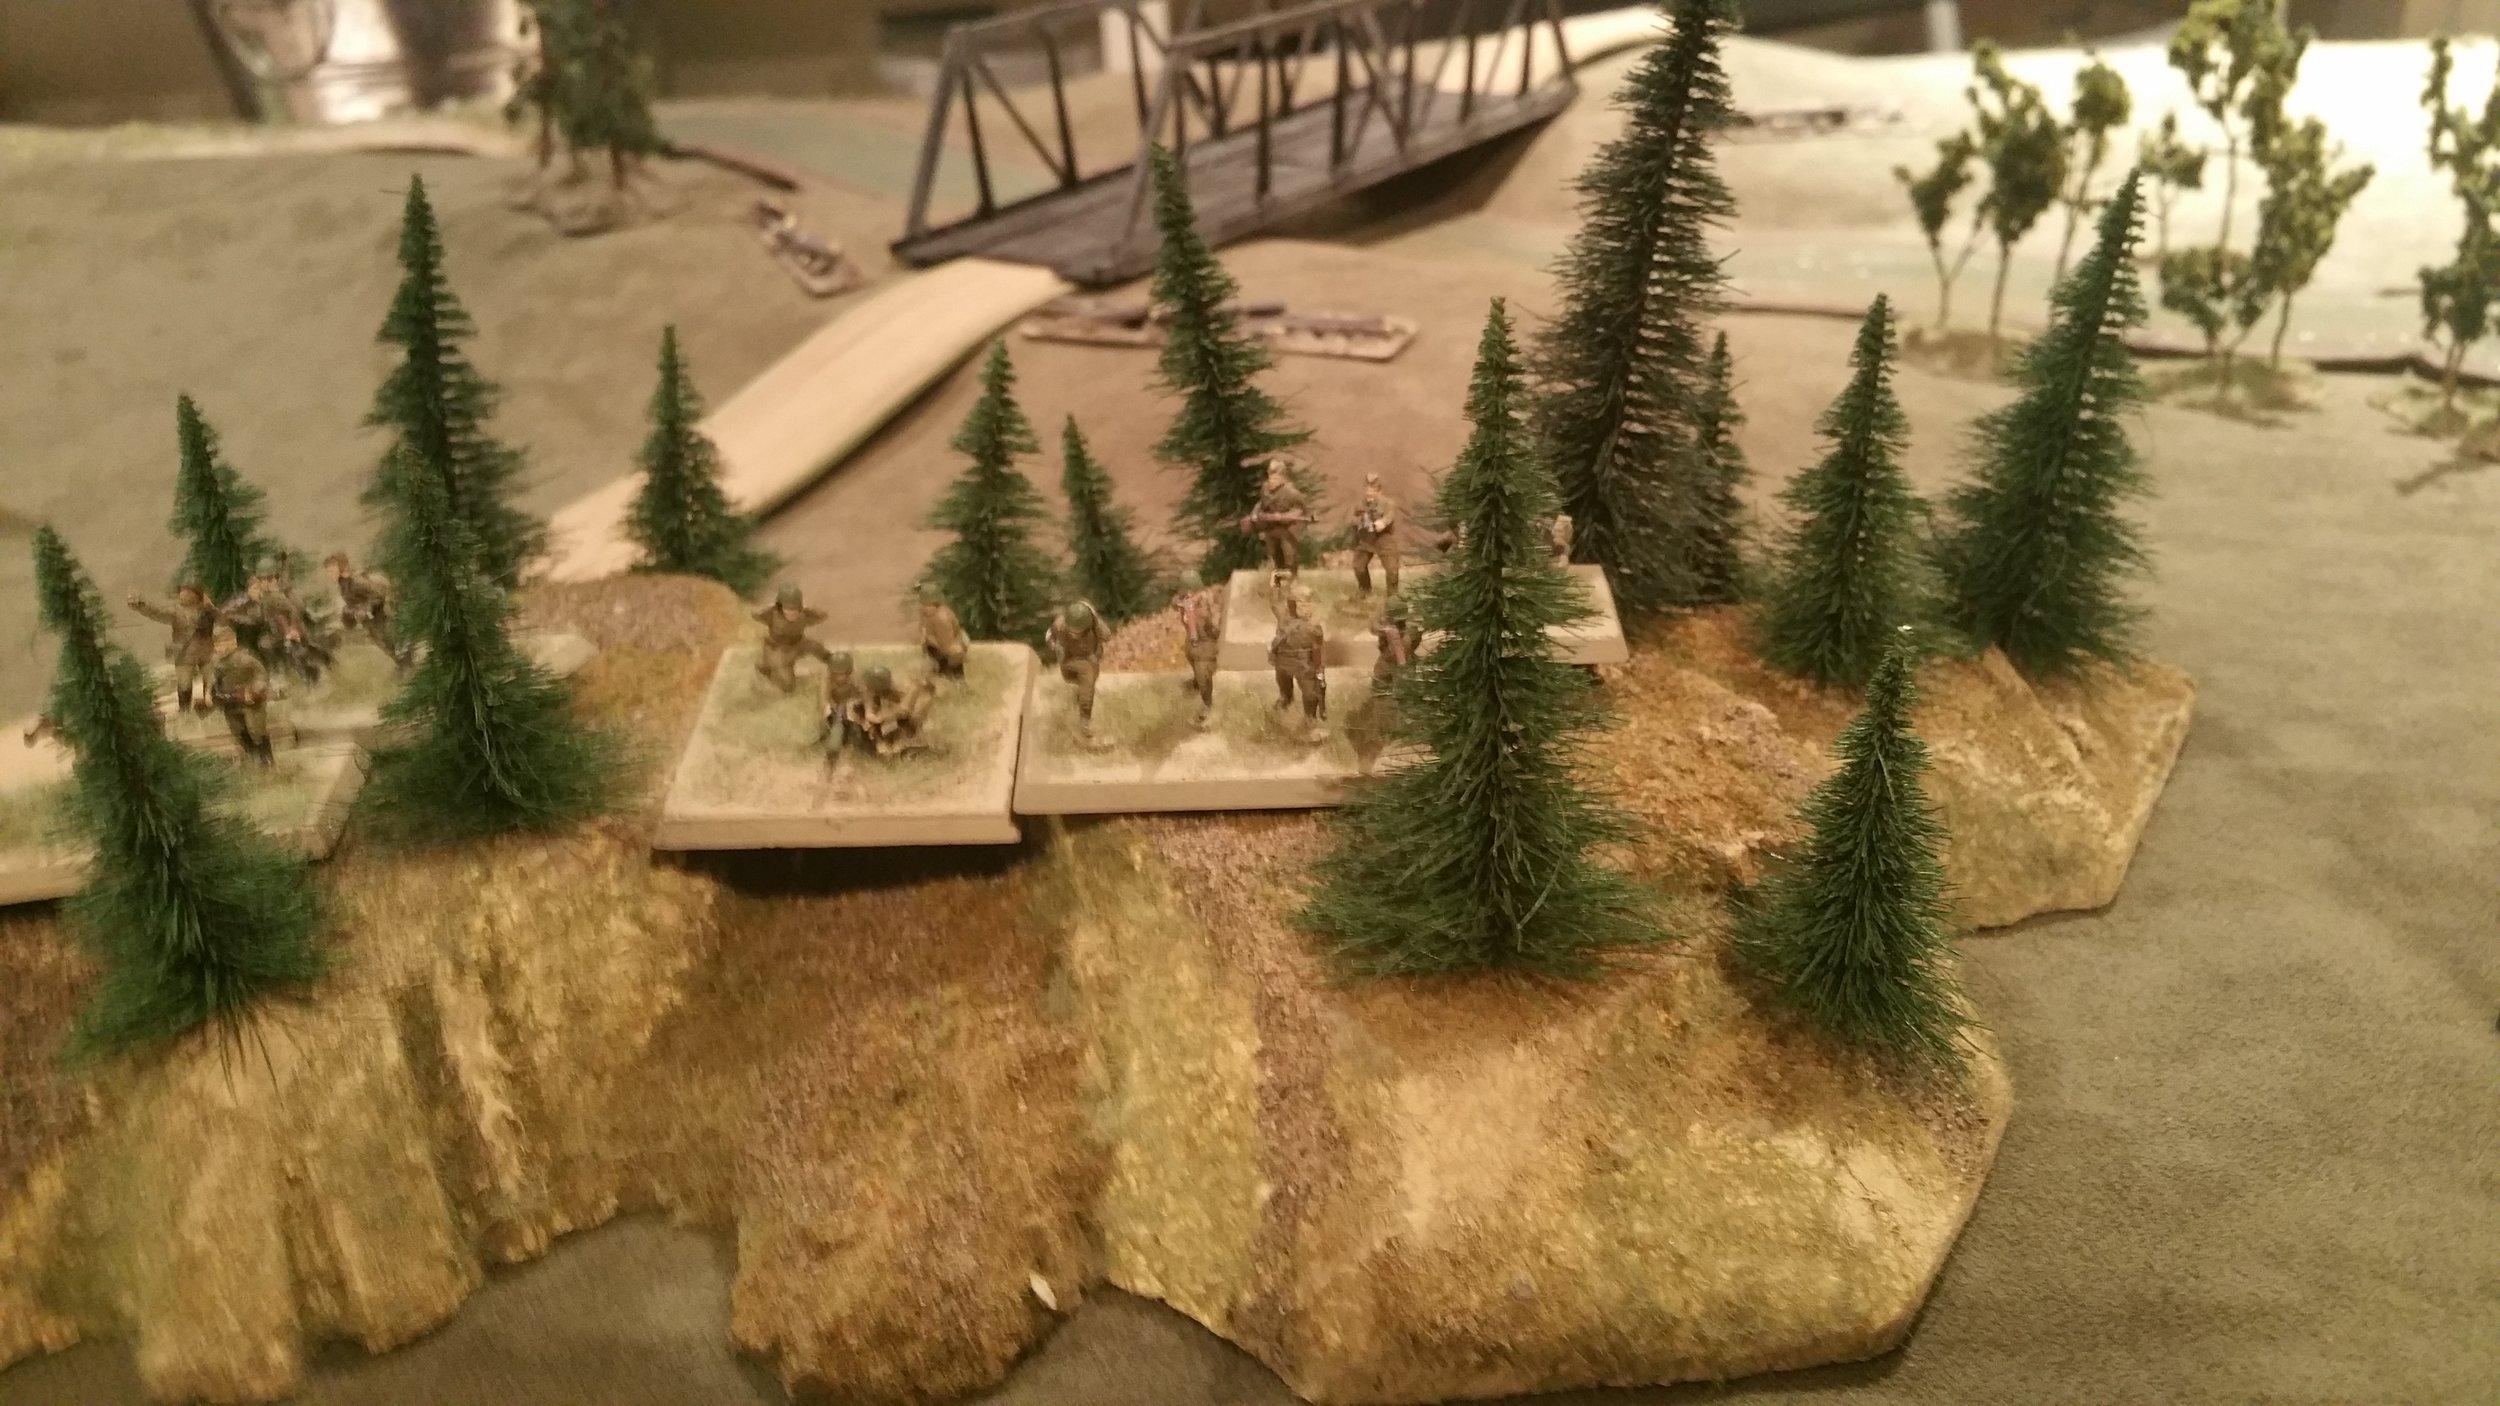 Russkie Platoon 2 Holds the Center